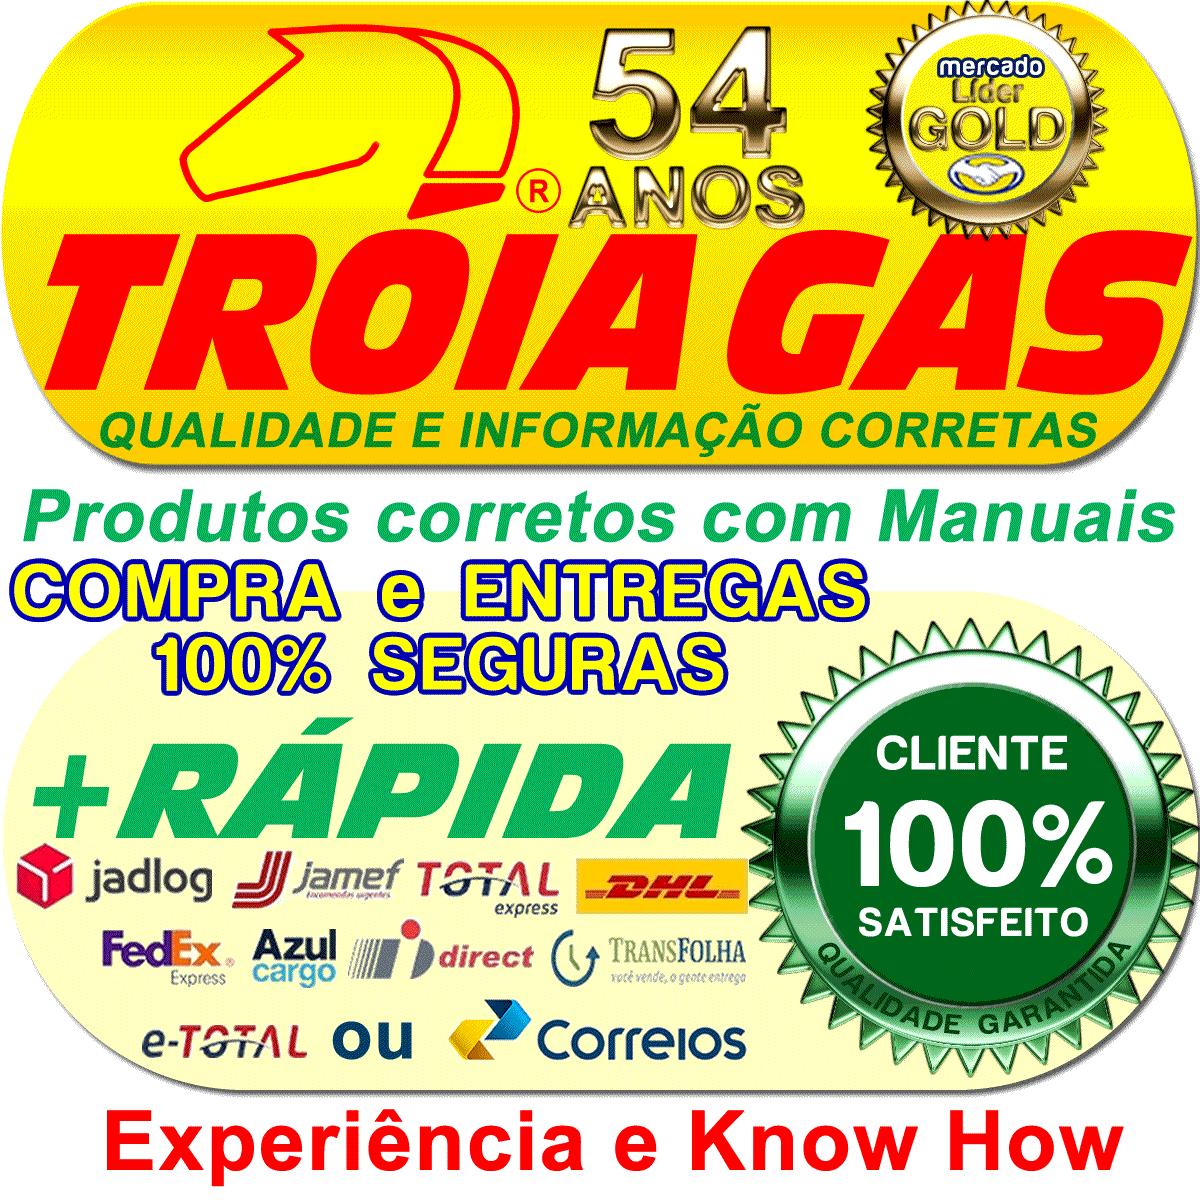 Chave Comutadora c/Manometro e Chicote T1000 A TURY GAS